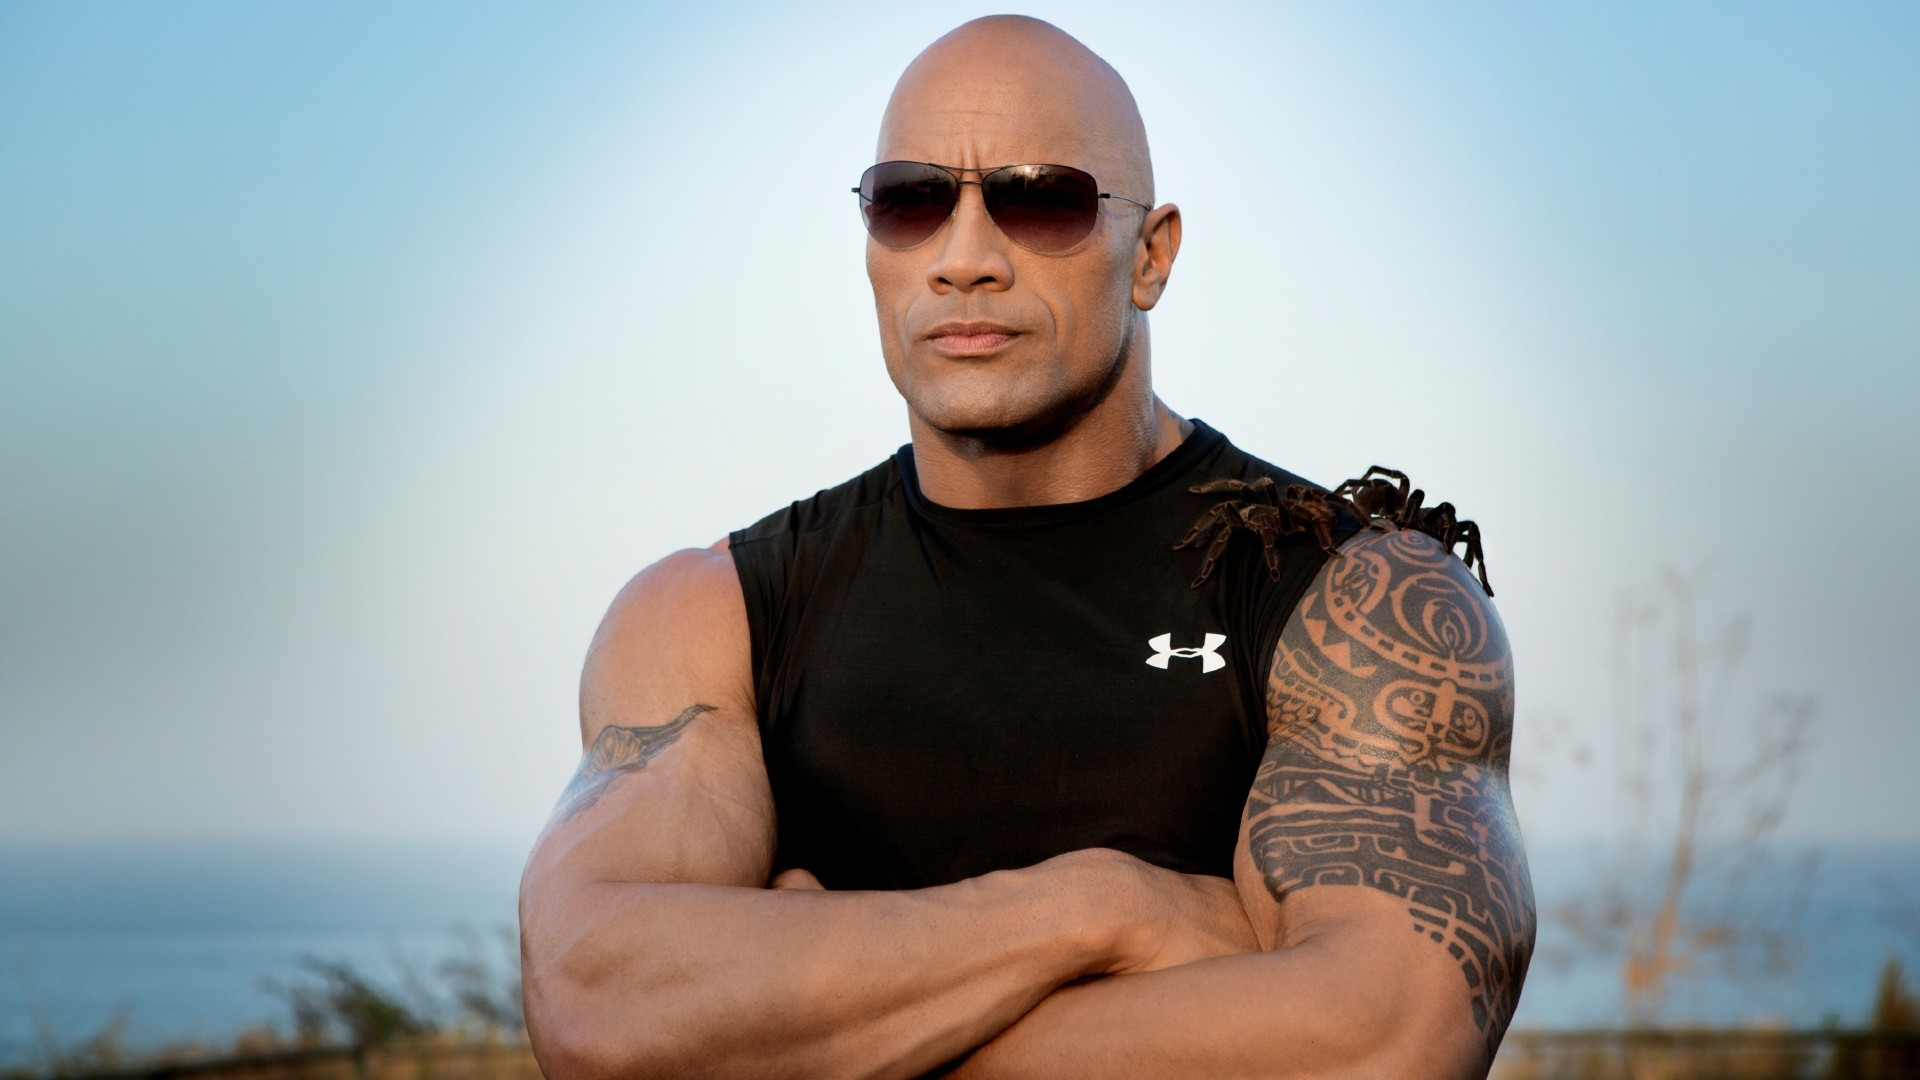 dwayne johnson muscles #11